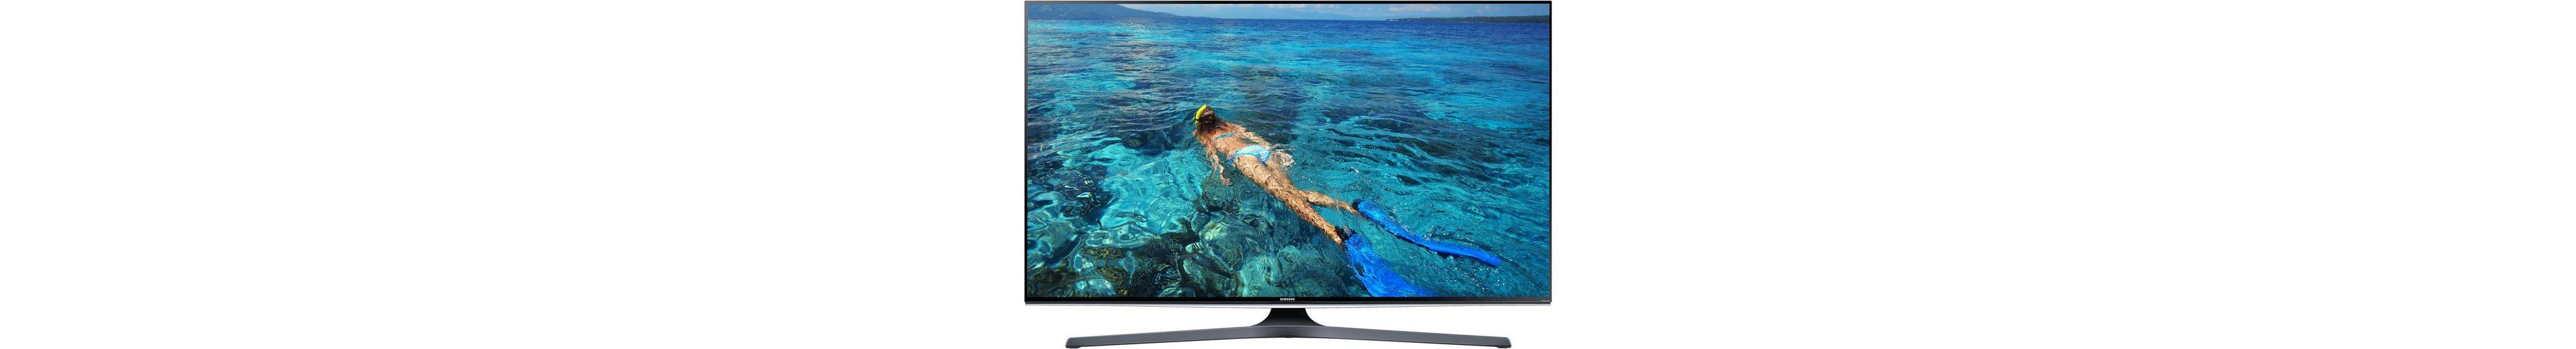 Samsung UE50J6289SUXZG, LED Fernseher, 125 cm (50 Zoll), 1080p (Full HD), Smart-TV